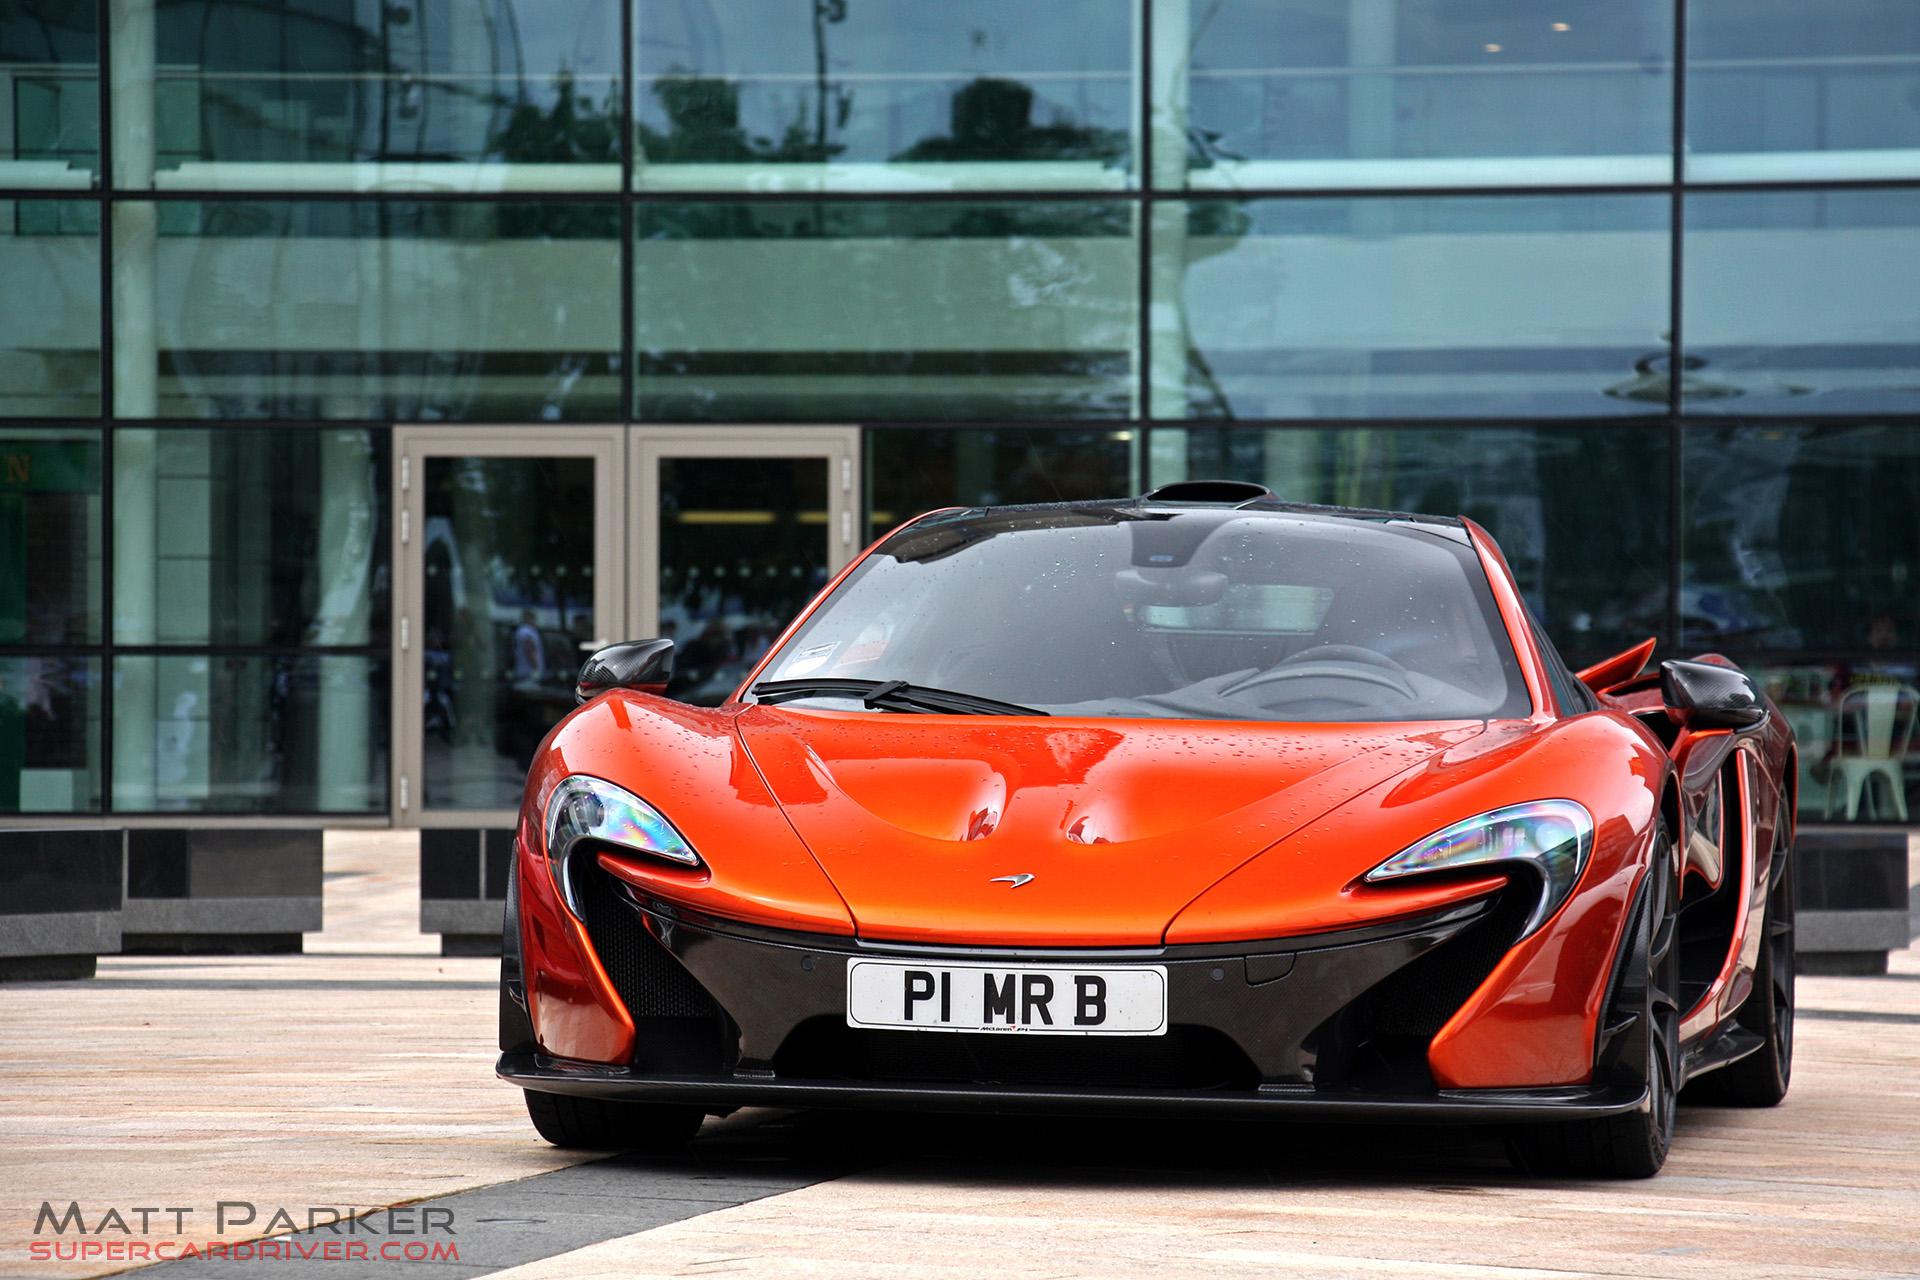 orange speed paul for volcano McLaren bailey need British Hybrid convoy supercar p1 Hypercar 953301